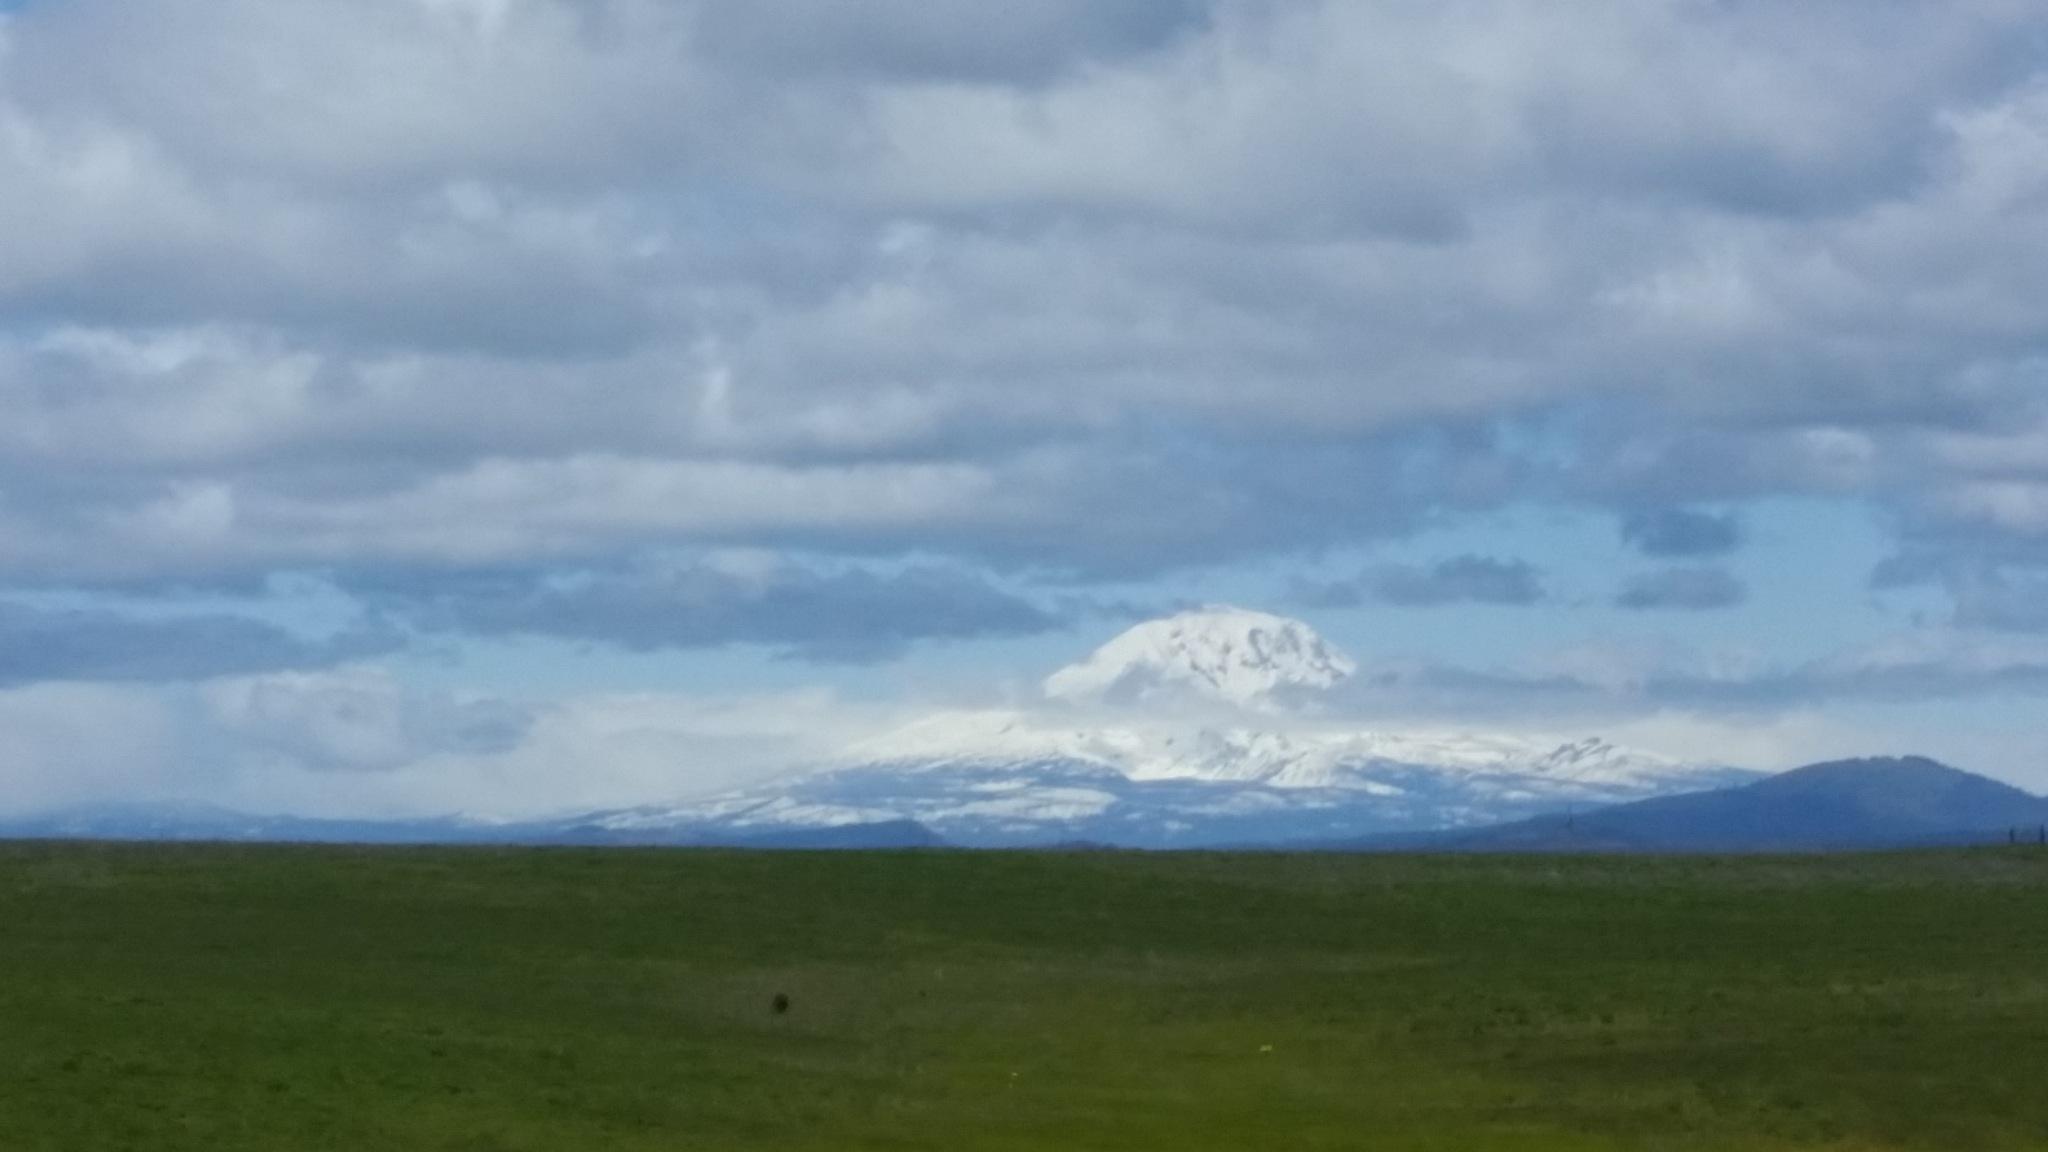 Mount Adams Washington State view from Goldendale Washington by B56